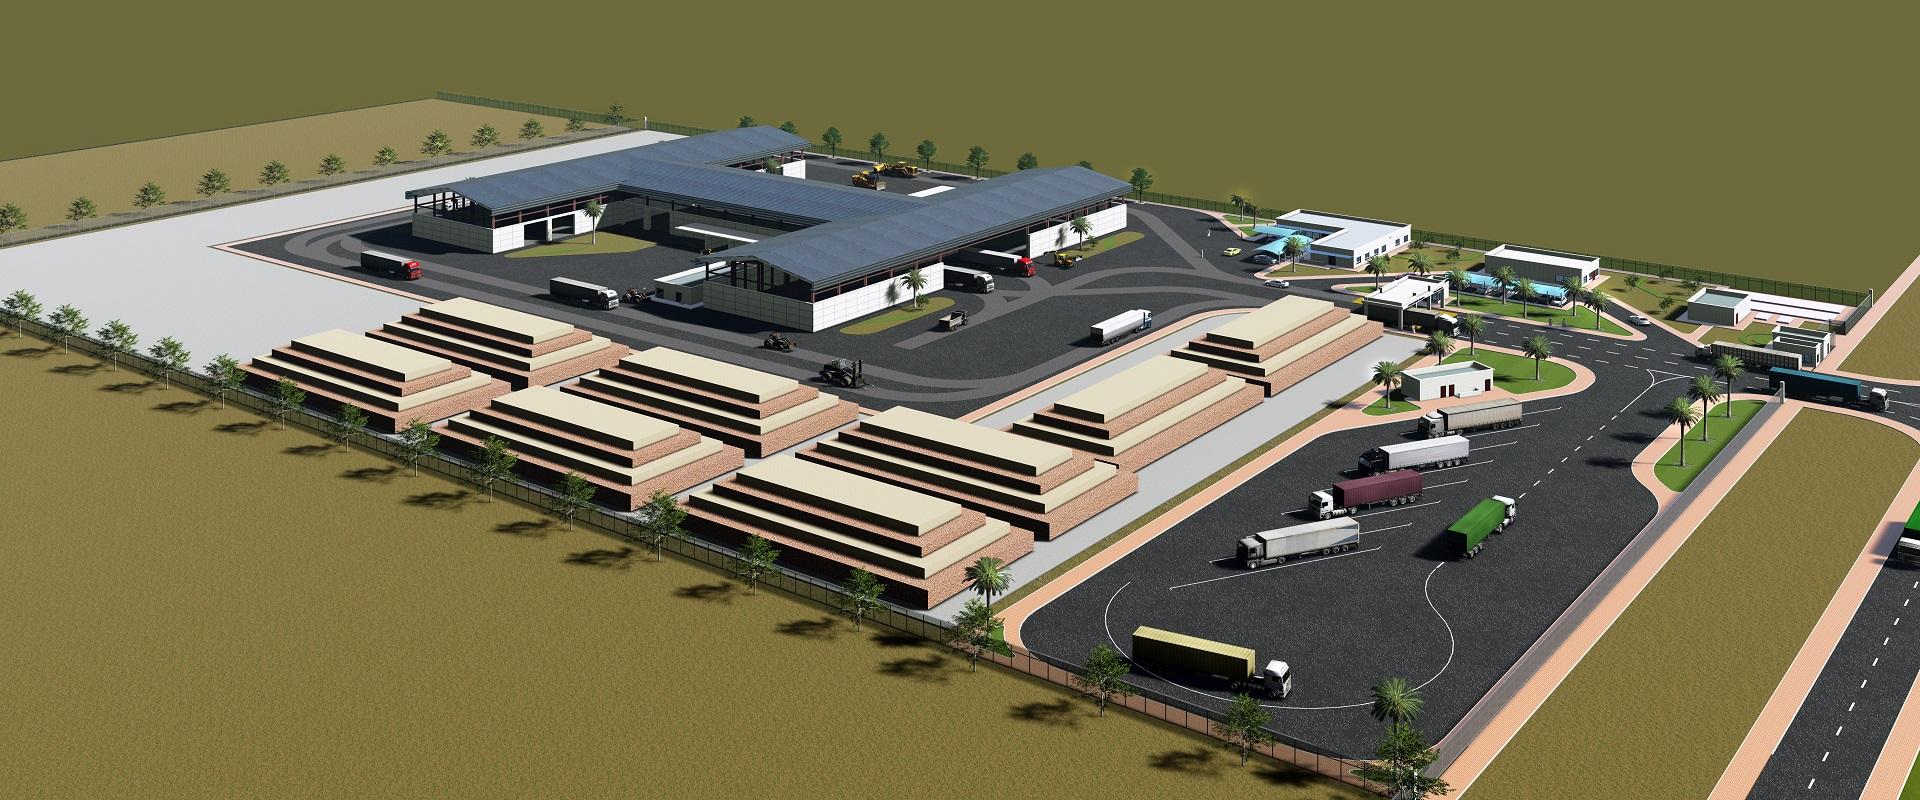 Emirates RDF - Refuse Derived Fuel Waste Management Facility UAE